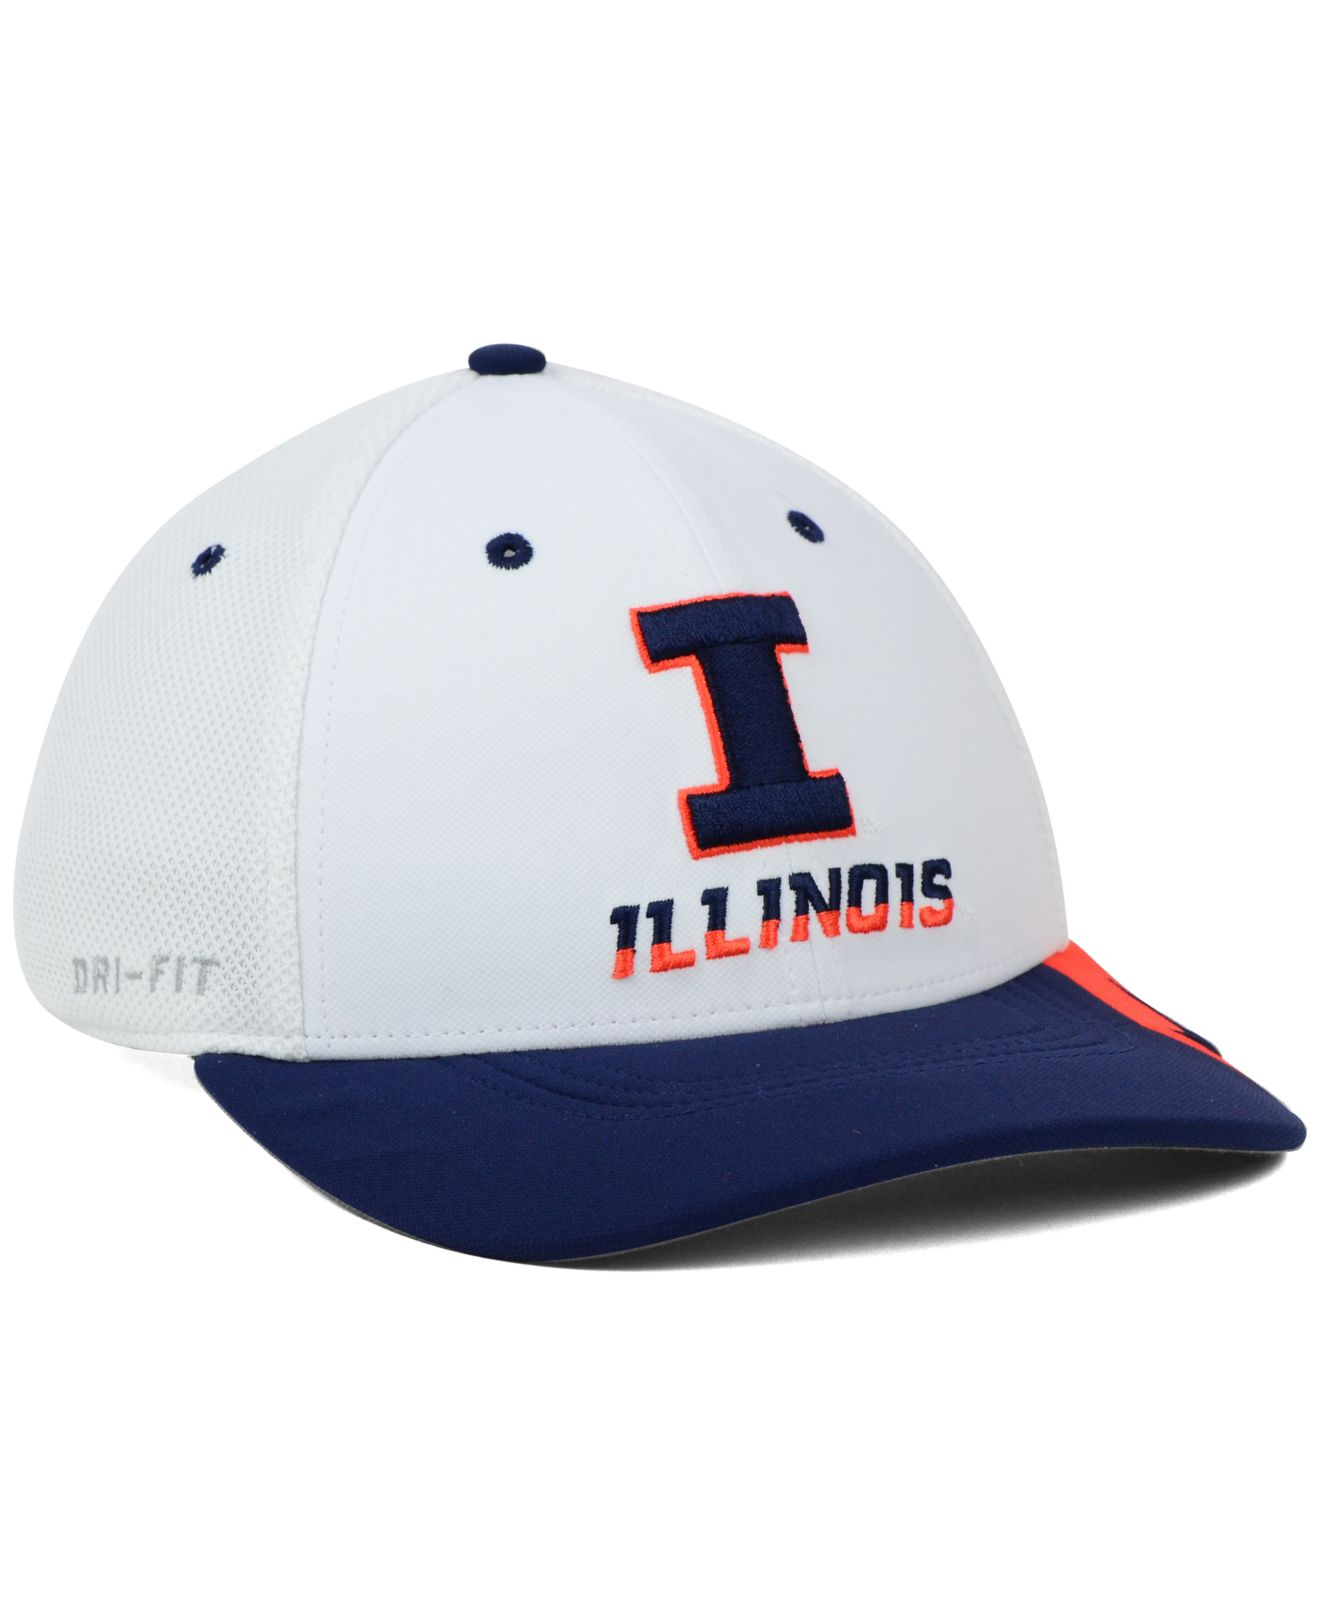 purchase cheap e5e03 1d22c ... best price lyst nike illinois fighting illini conference swf cap in  blue for men 429f0 d059e